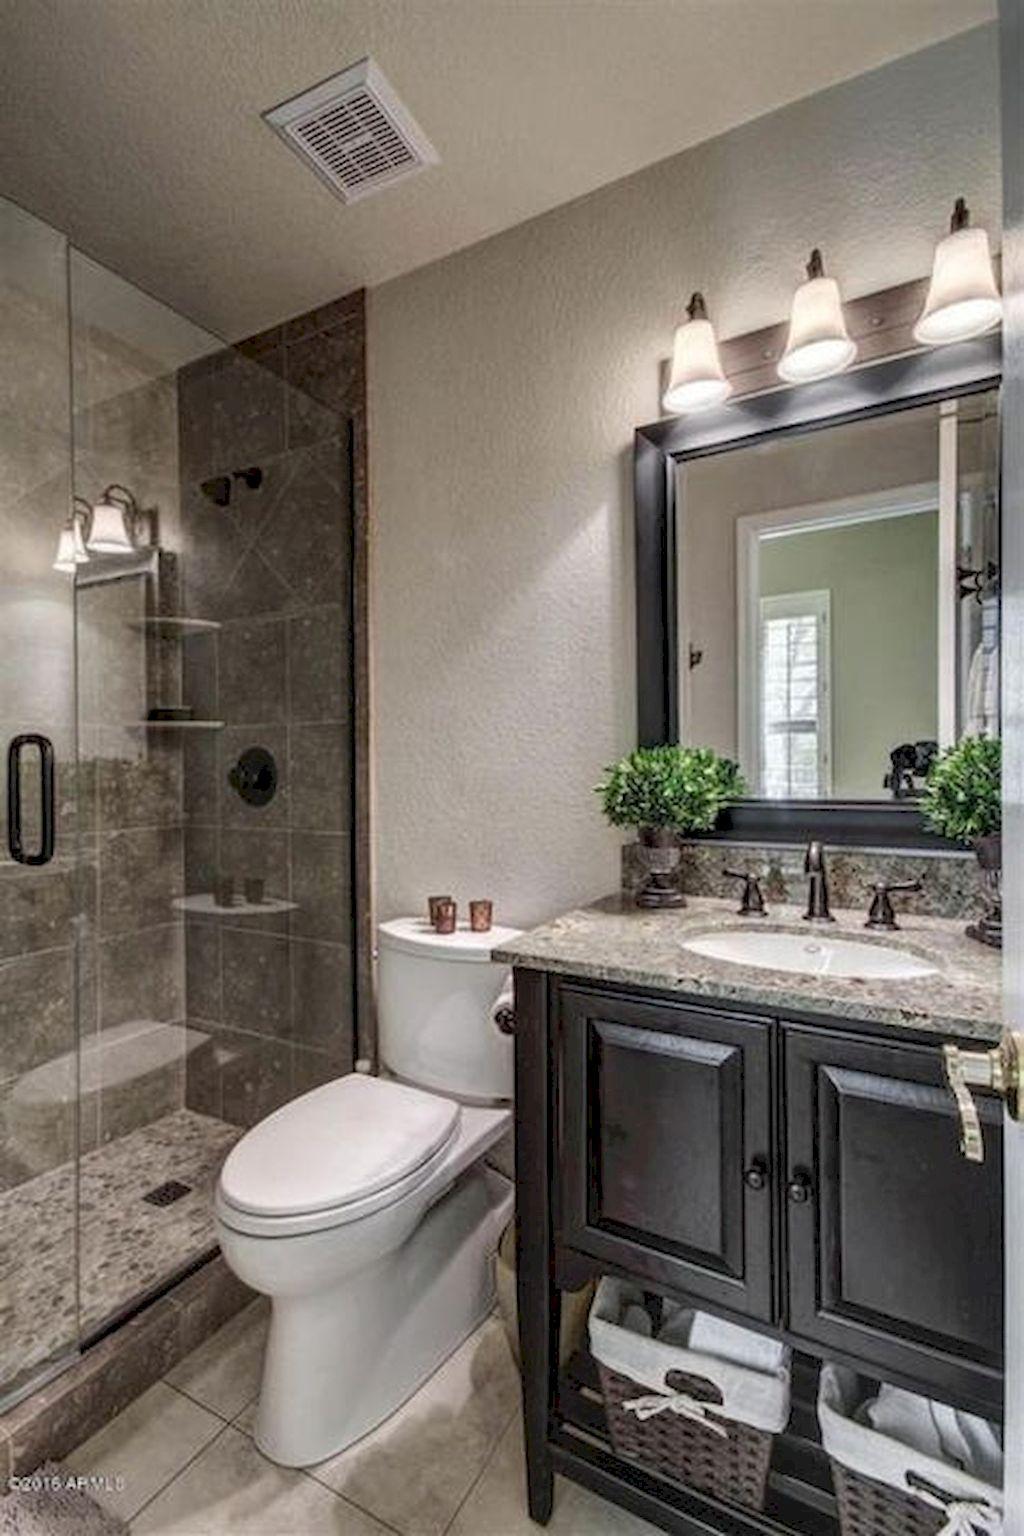 111 awesome small bathroom remodel ideas on a budget (5 ... on Small Bathroom Ideas Pinterest id=54161